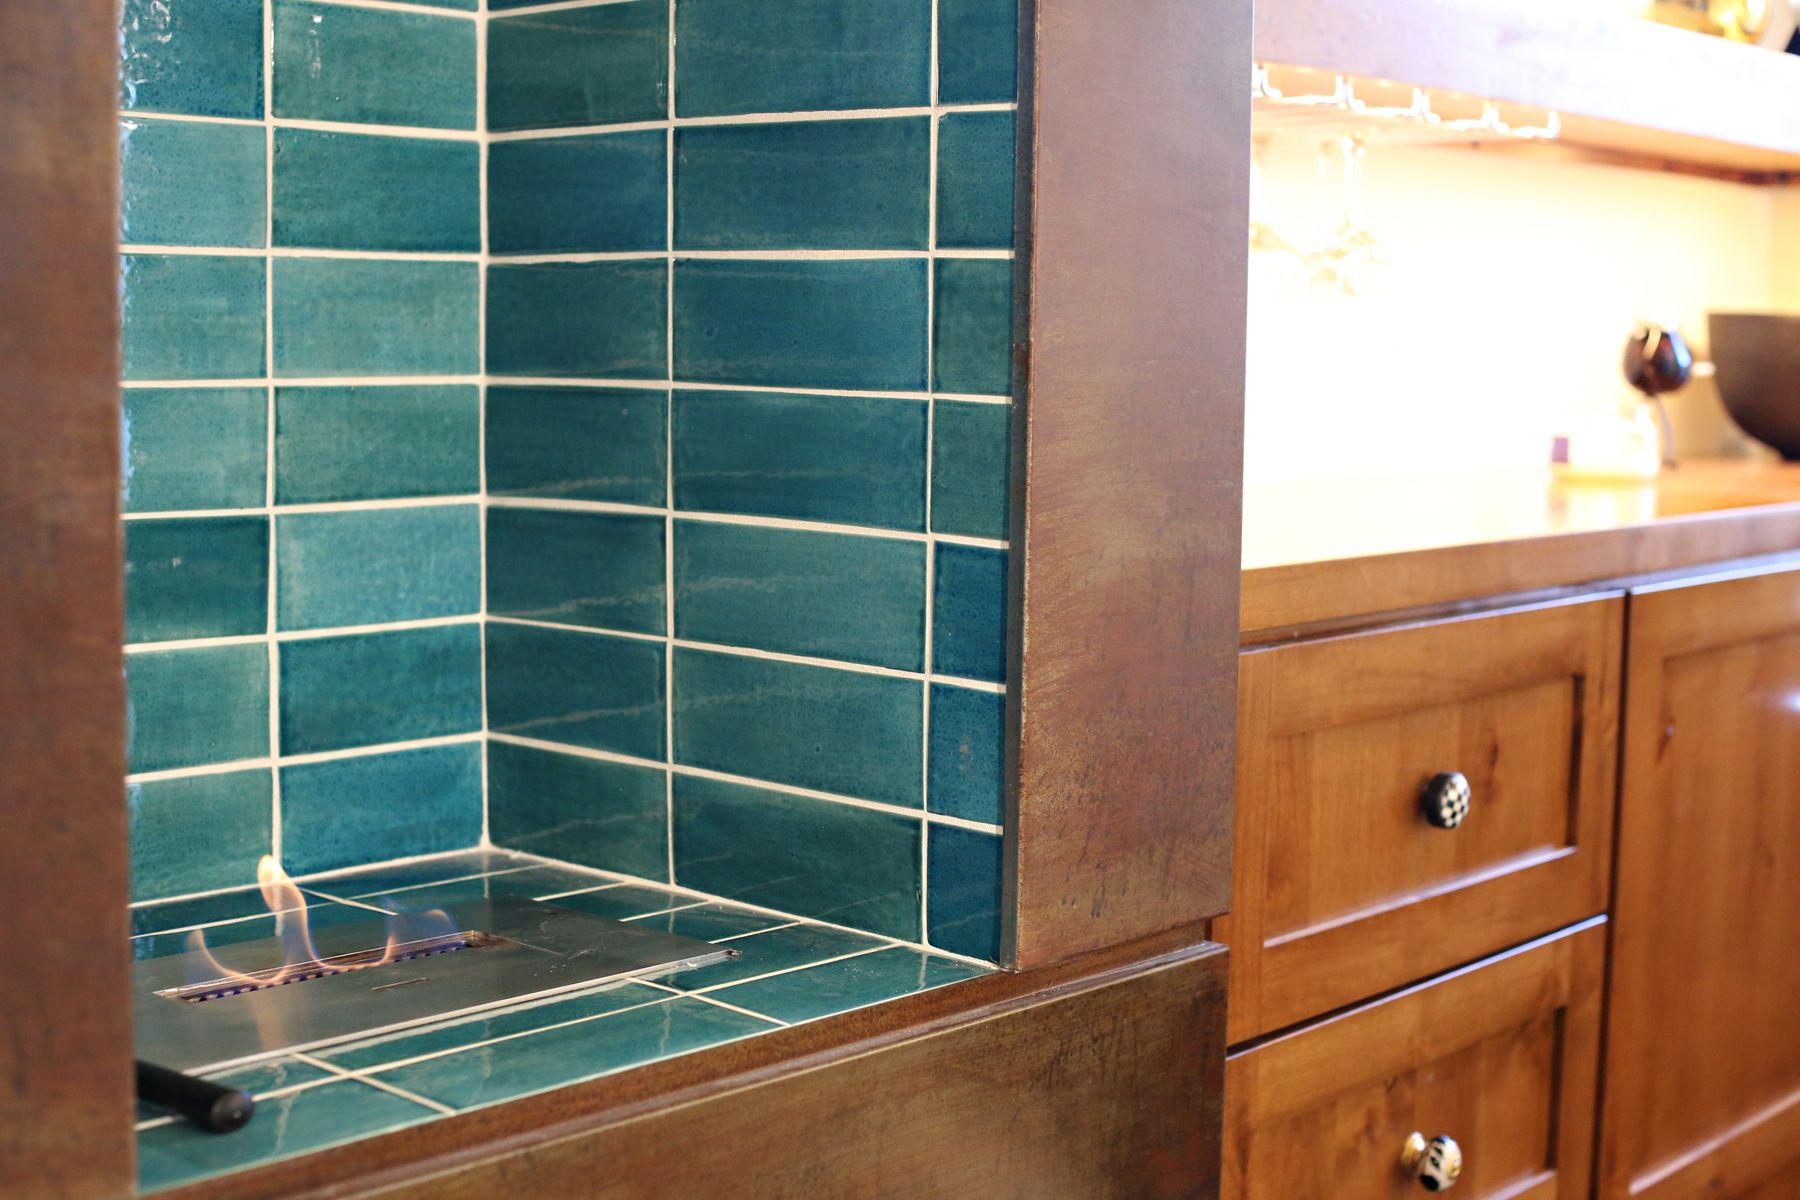 Pin by Juliann McDermott on bathroom ideas | Pinterest | Subway ...